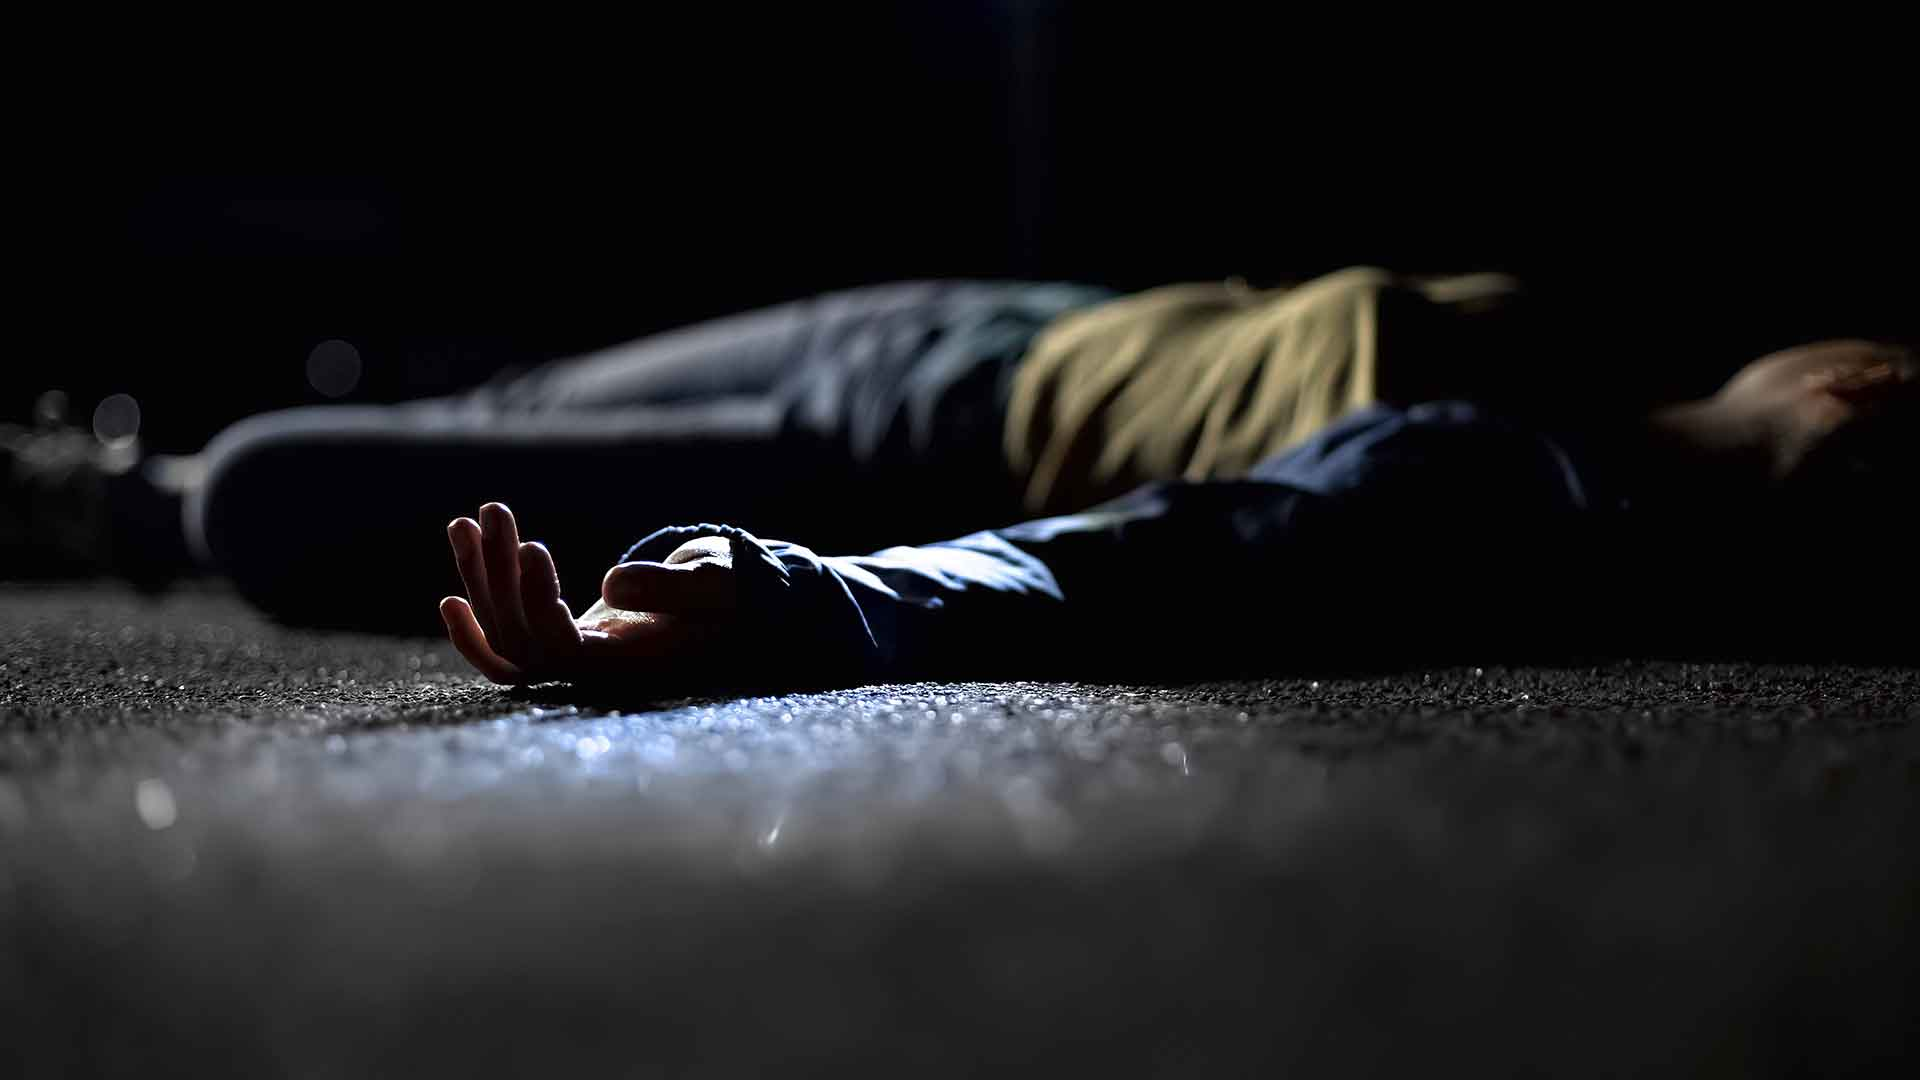 Moord en doodslag strafrecht advocaat - Weening Strafrechtadvocaten